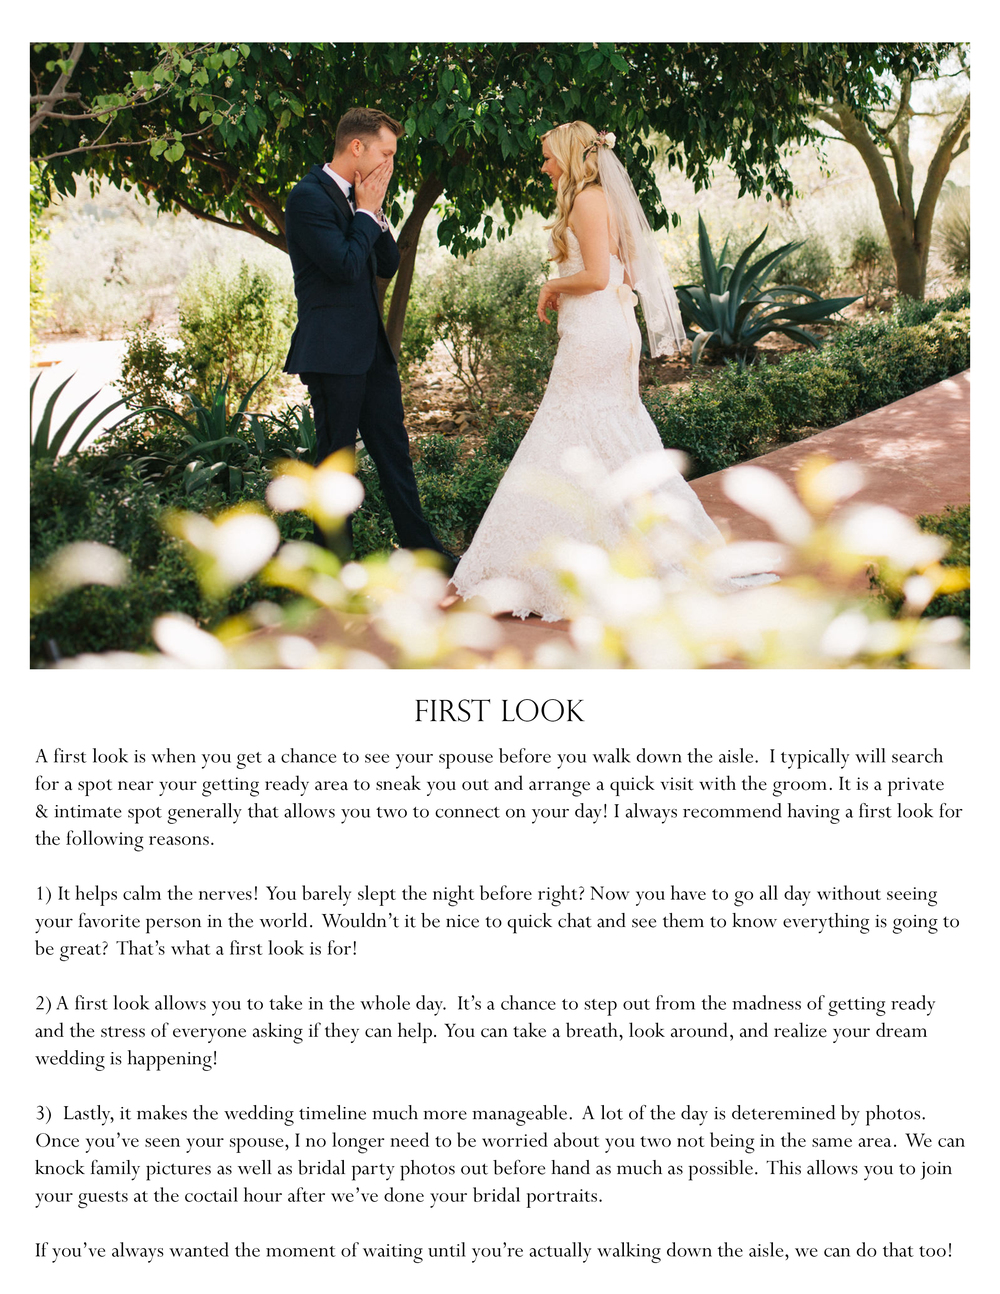 Wedding PDF Page 2.jpg